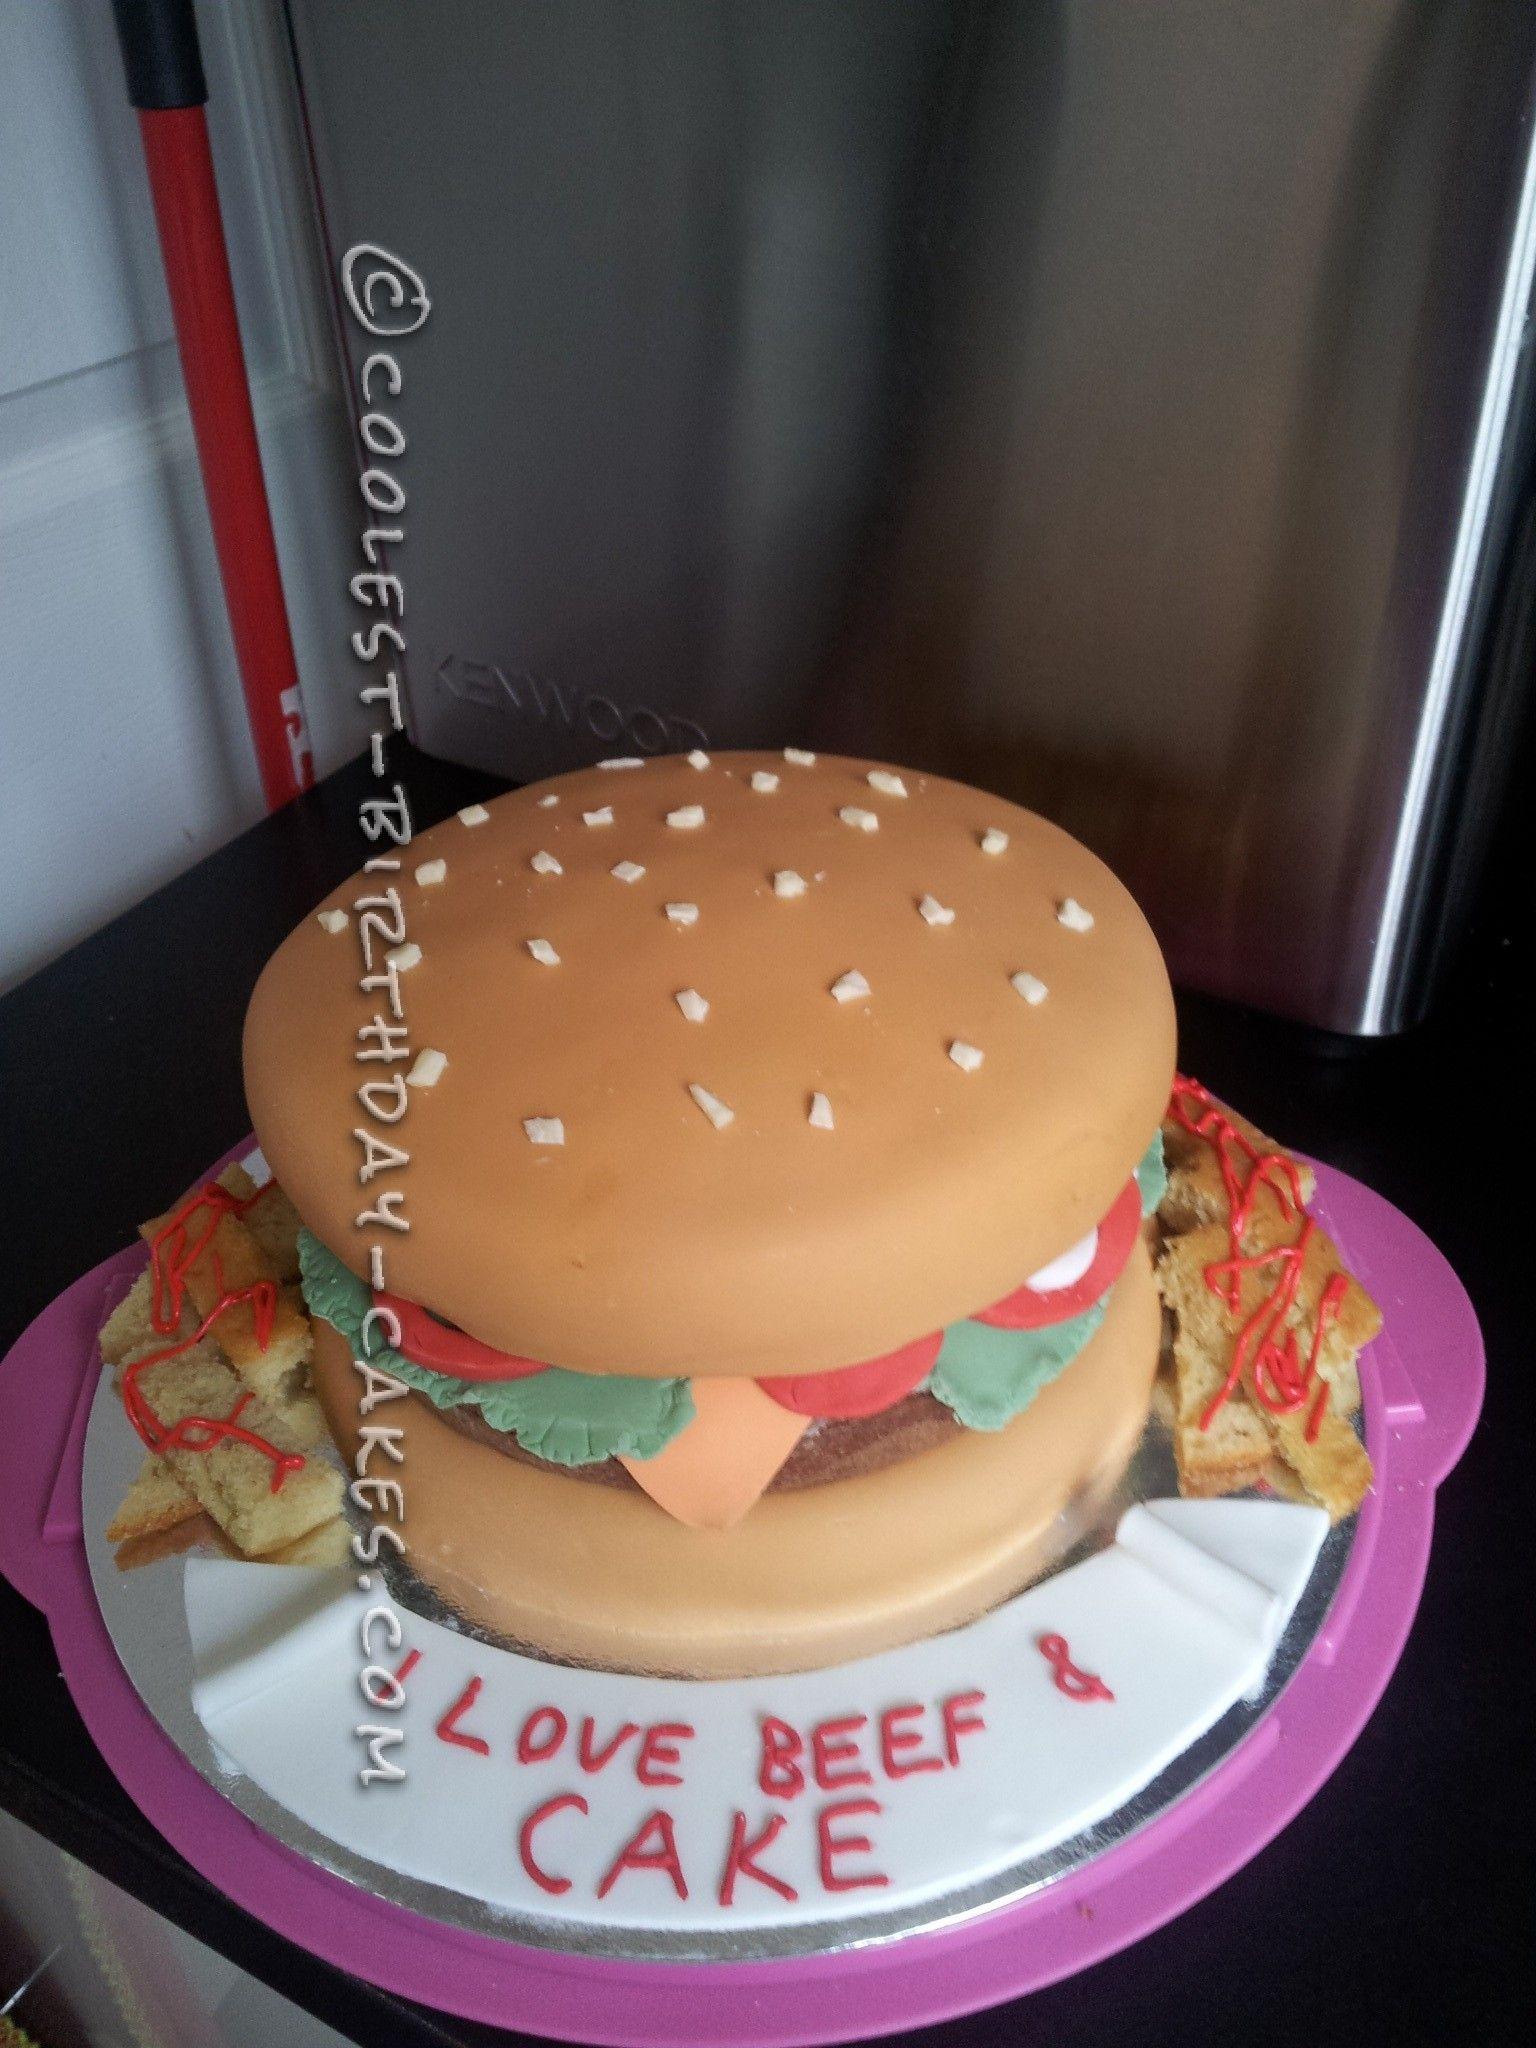 Coolest Homemade Fondant Cheeseburger Birthday Cake And Fries